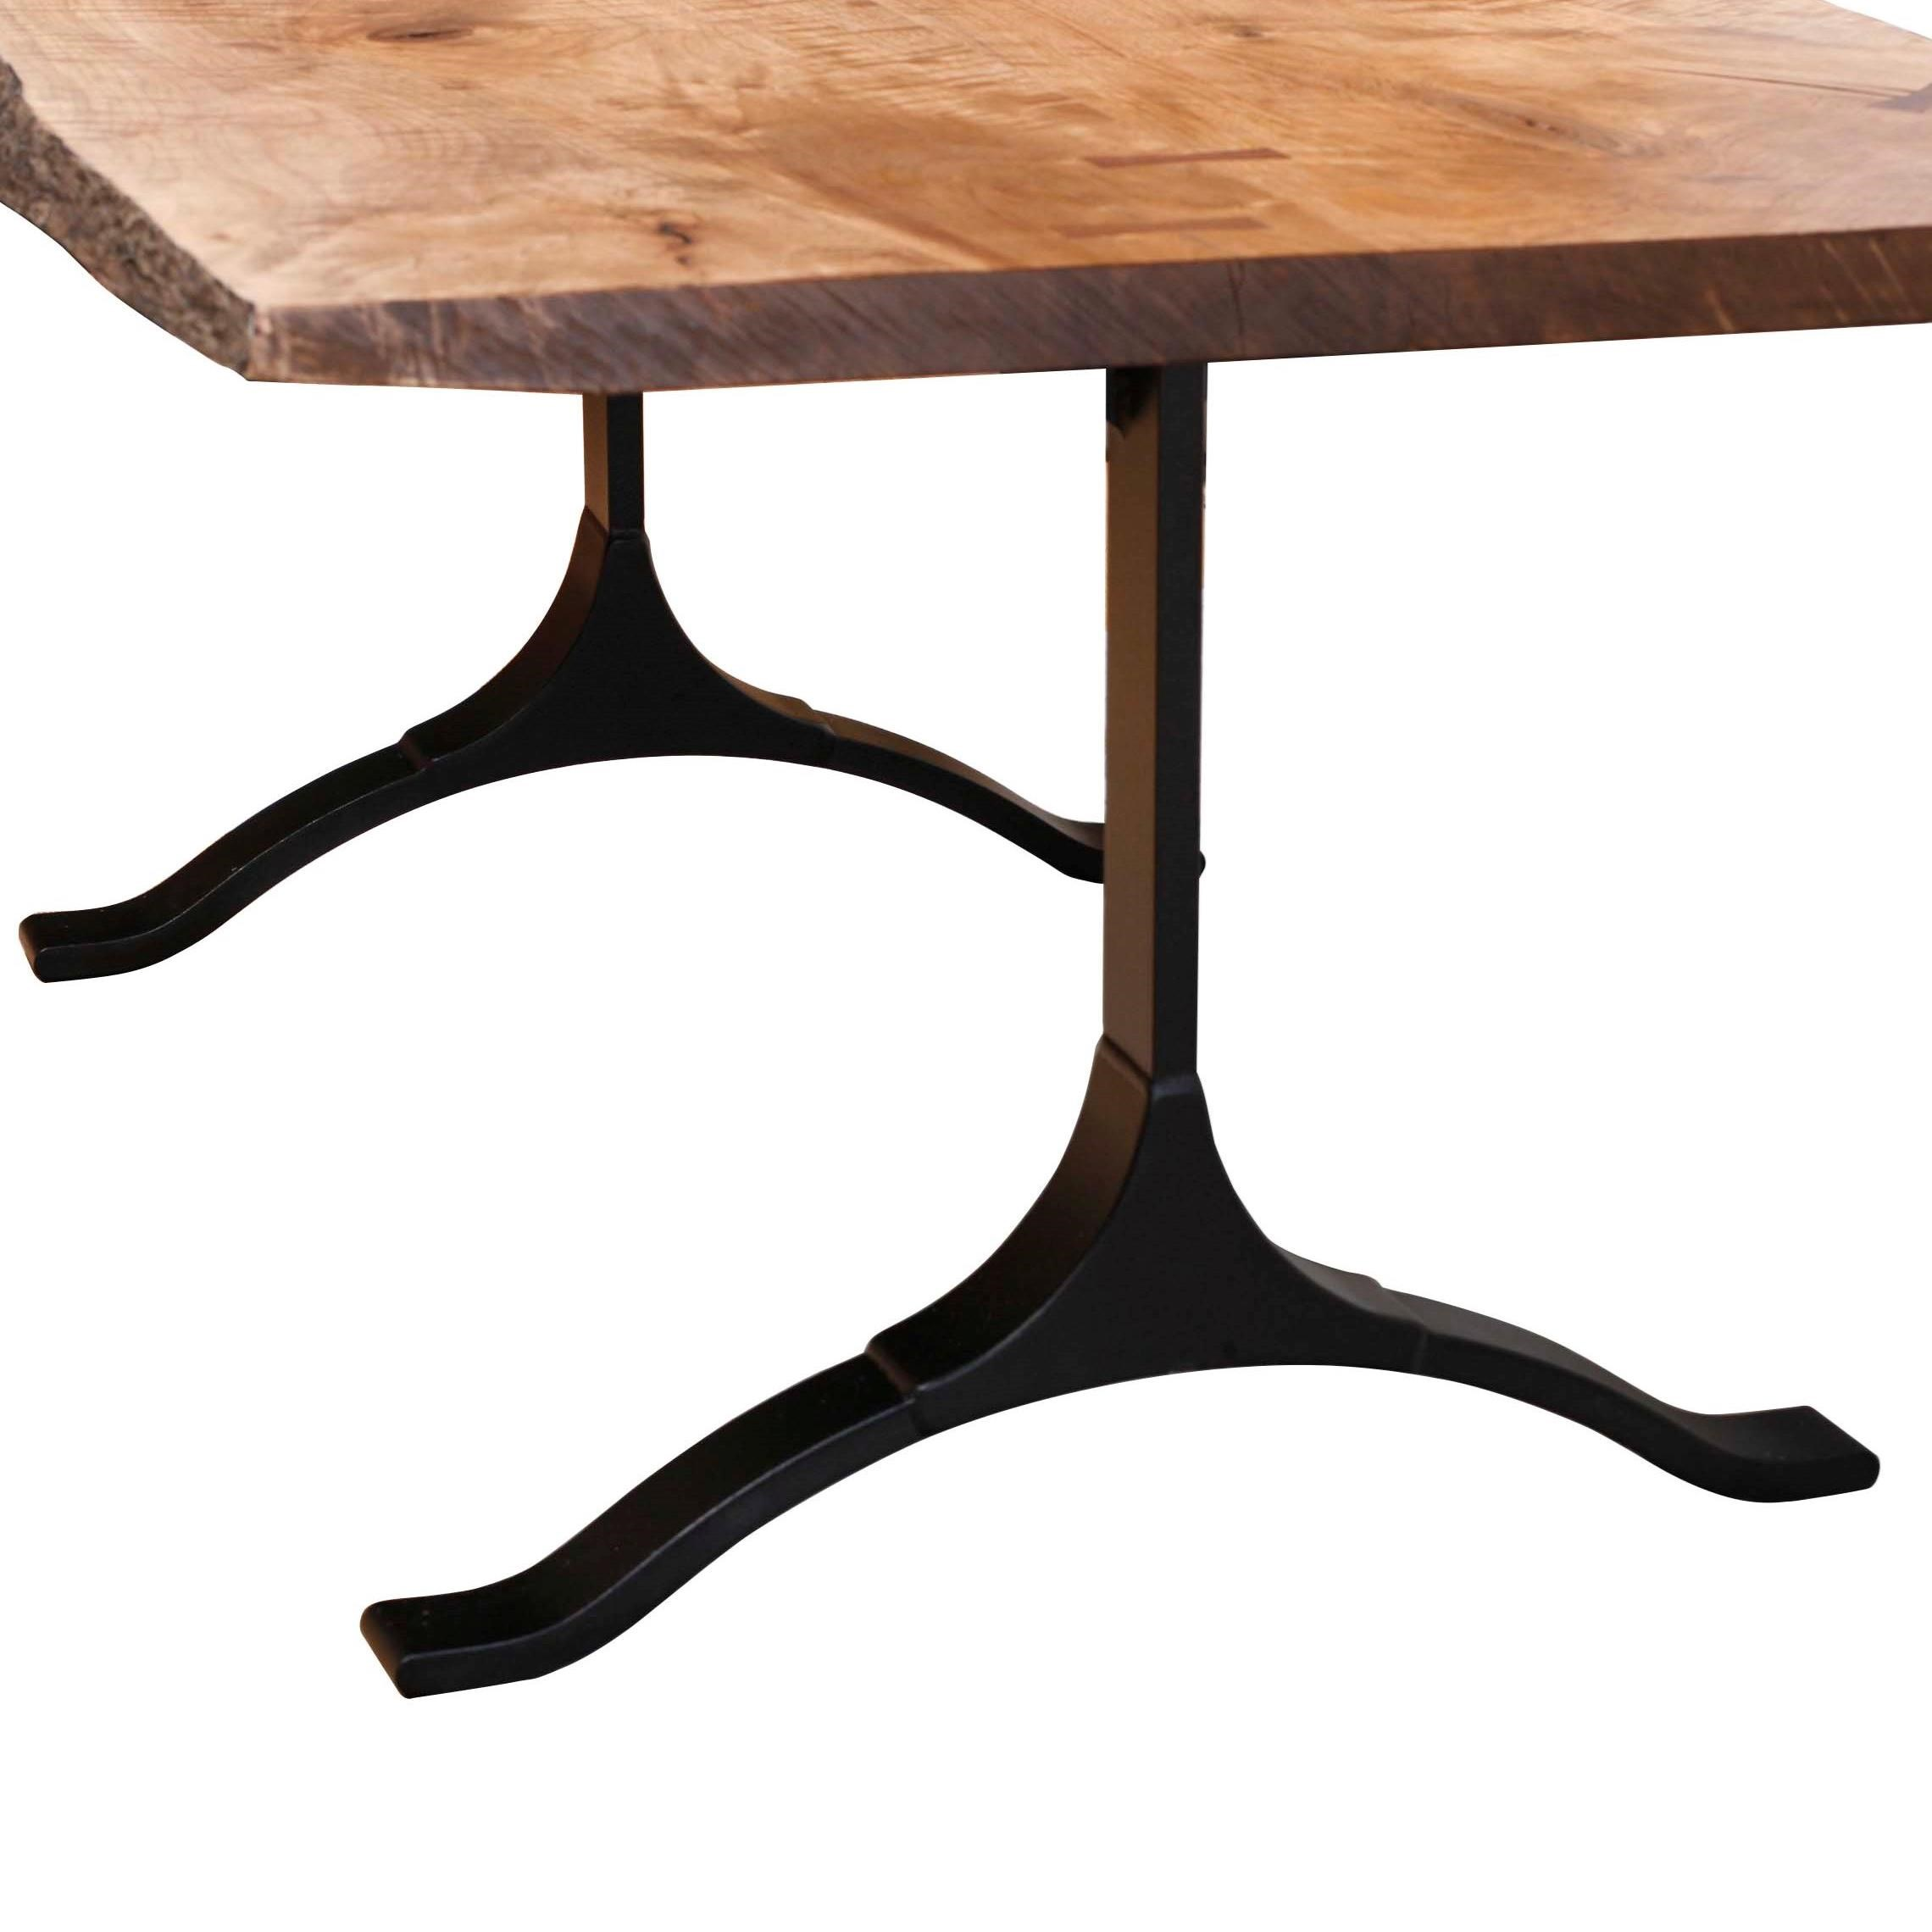 zimmerman chair live edge furniture